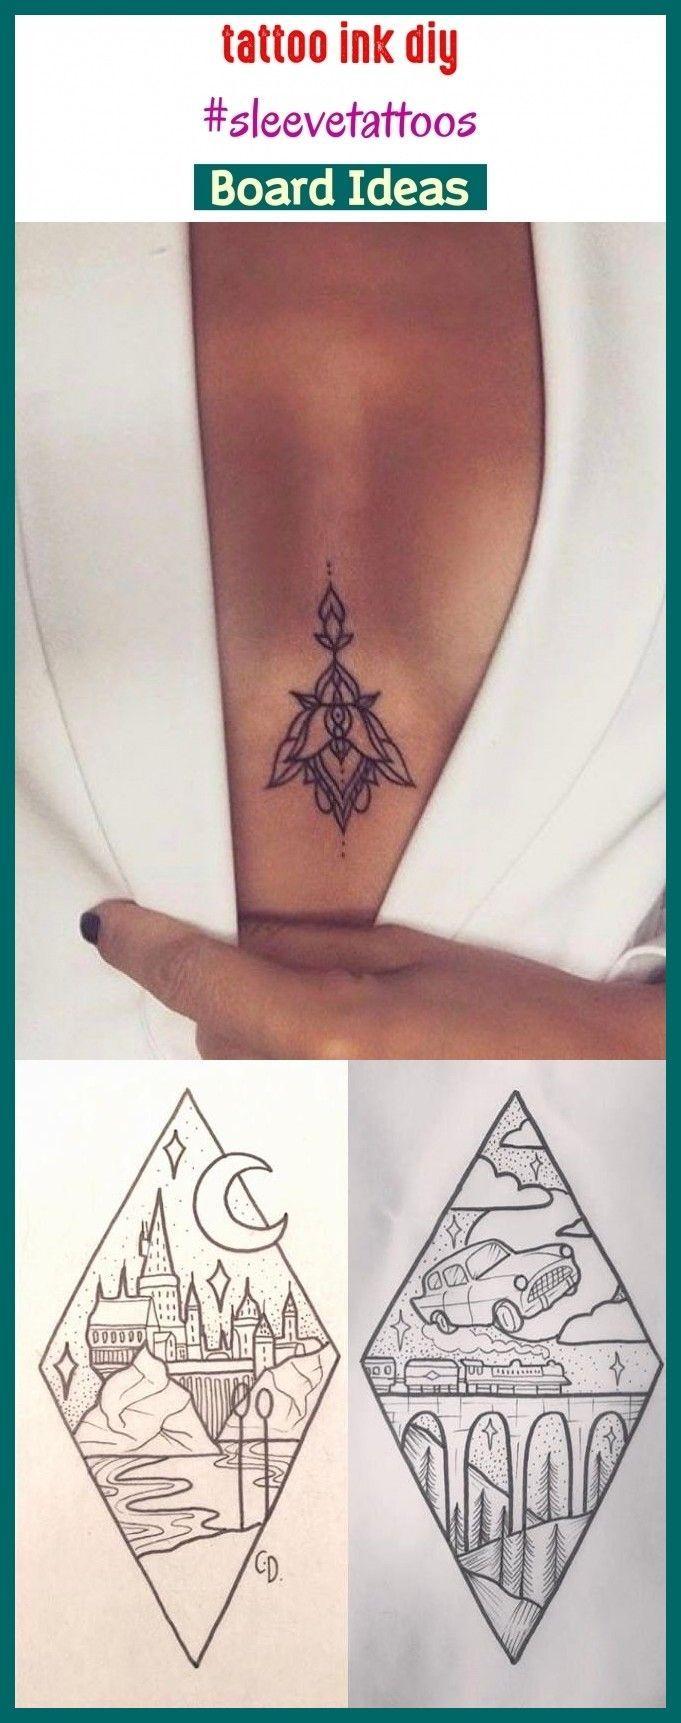 Tattoo ink diy . tattoo ink colors, tattoo - Tattoo ink diy . tattoo ink colors, tattoo